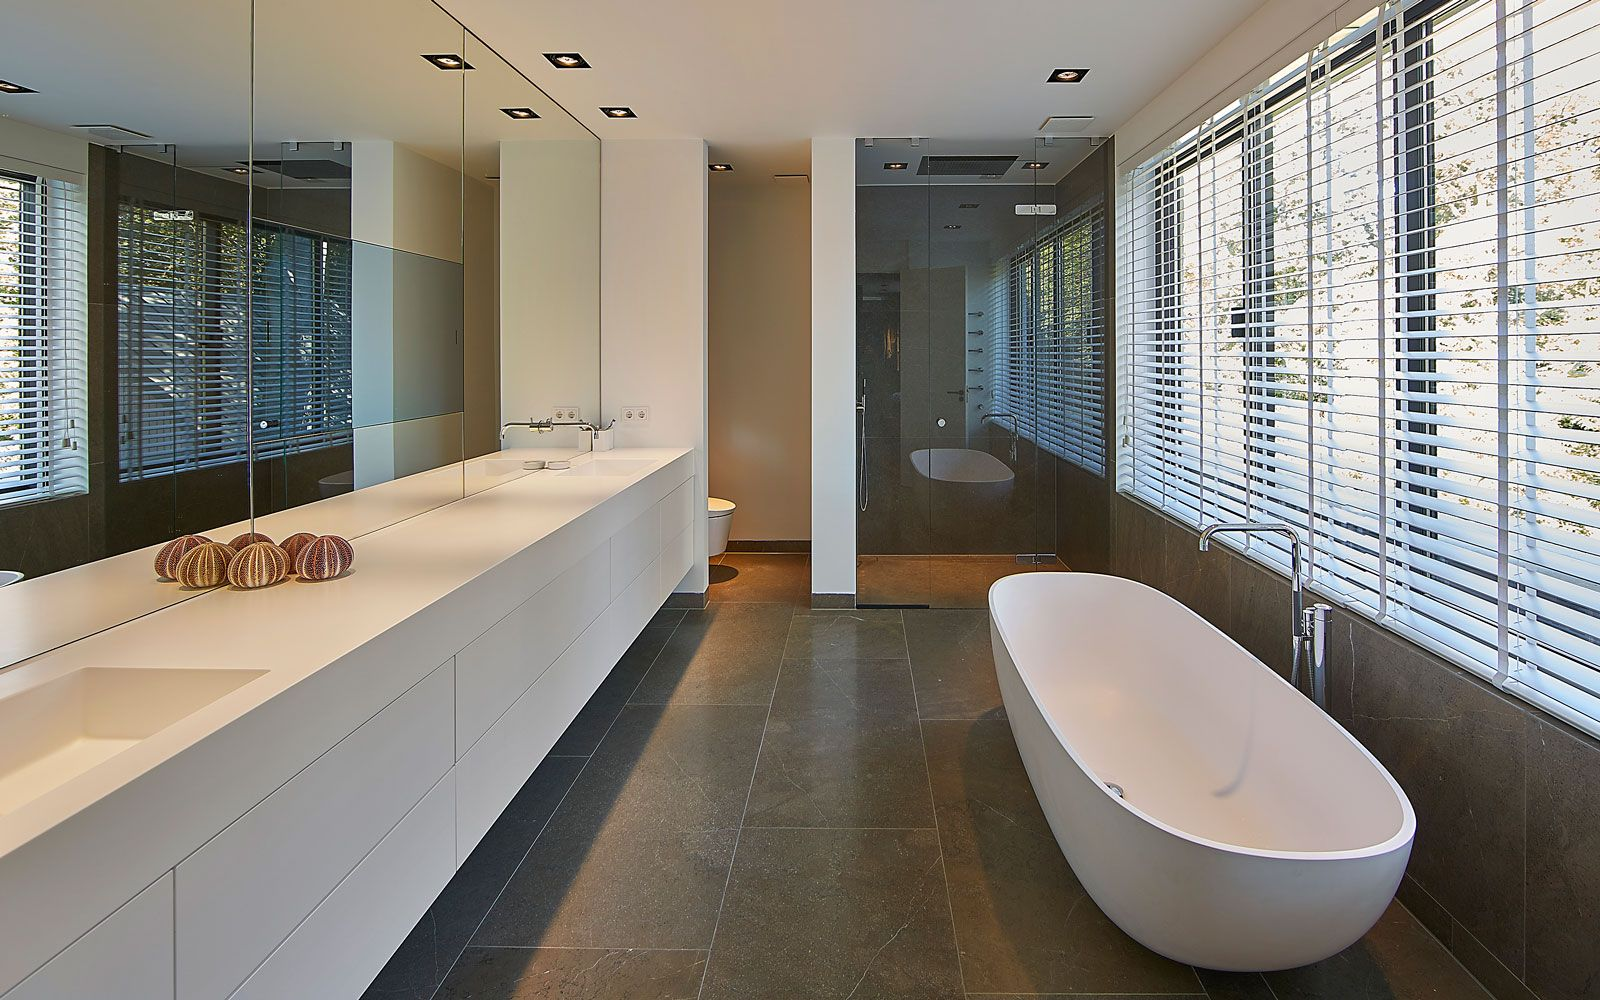 Symmetrische villa badkamer pinterest villas architects and